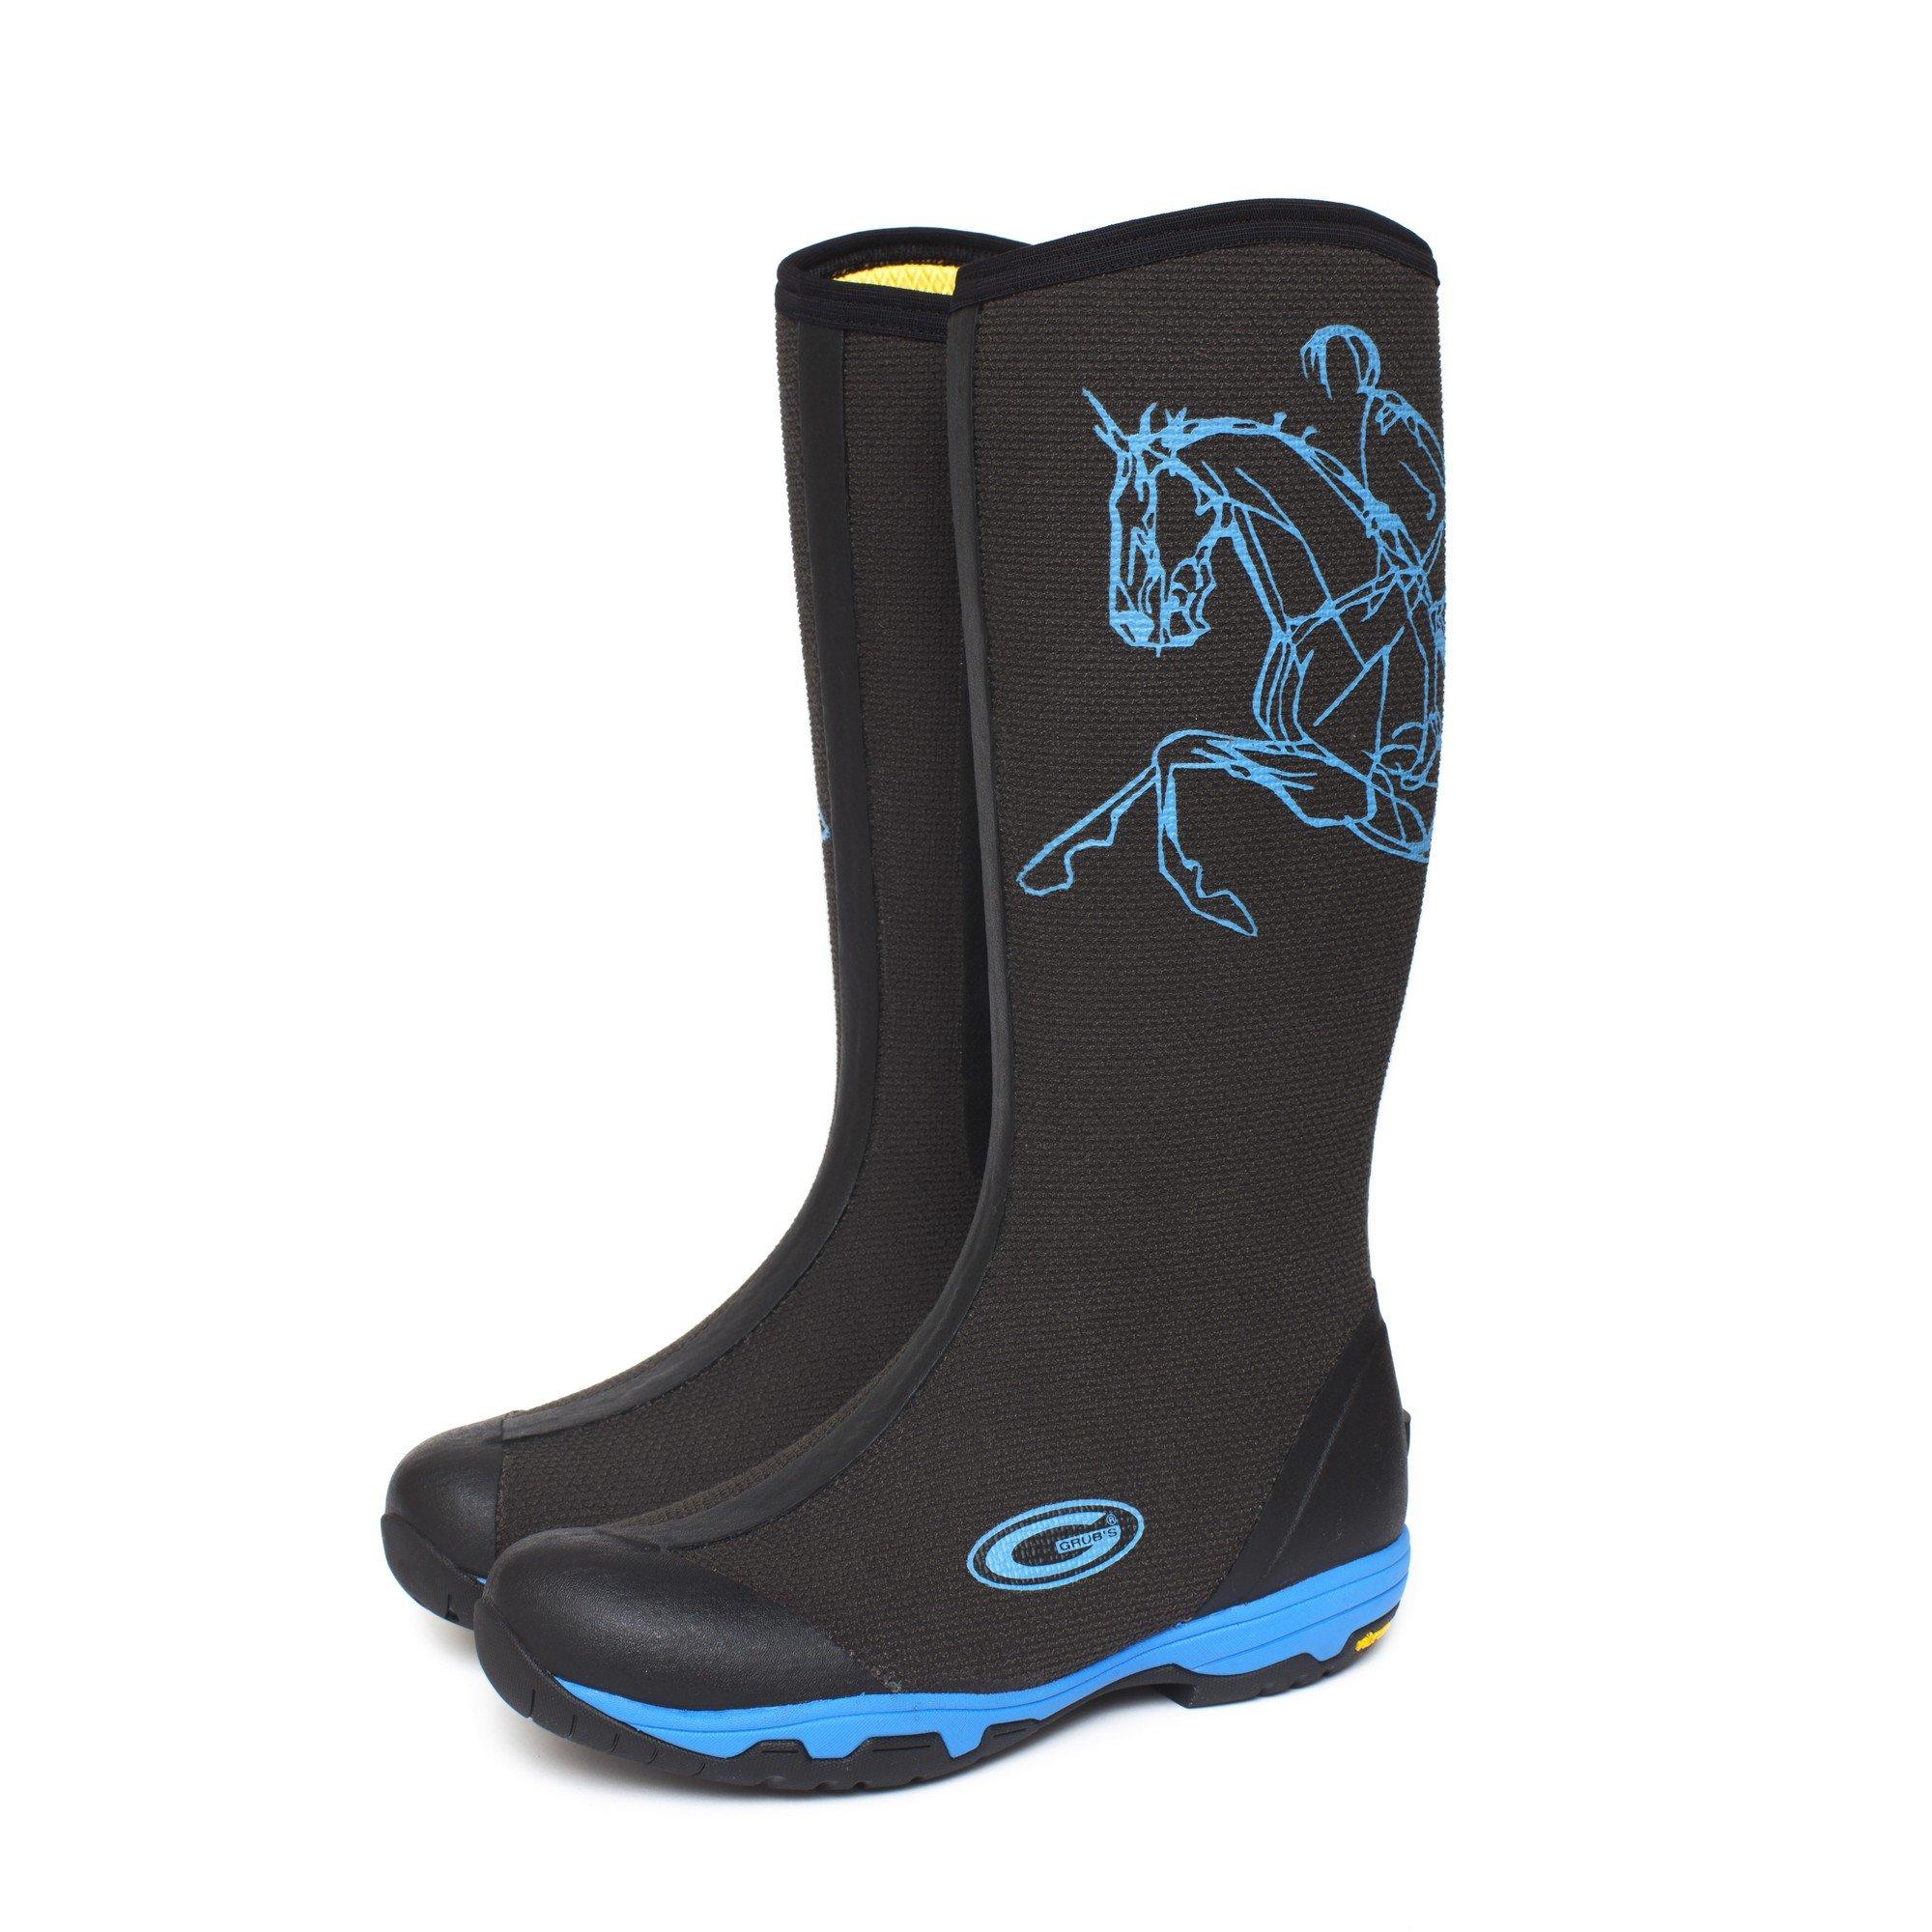 Grubs Womens/Ladies Ramilo SE Boots (10 US) (Black/Blue)